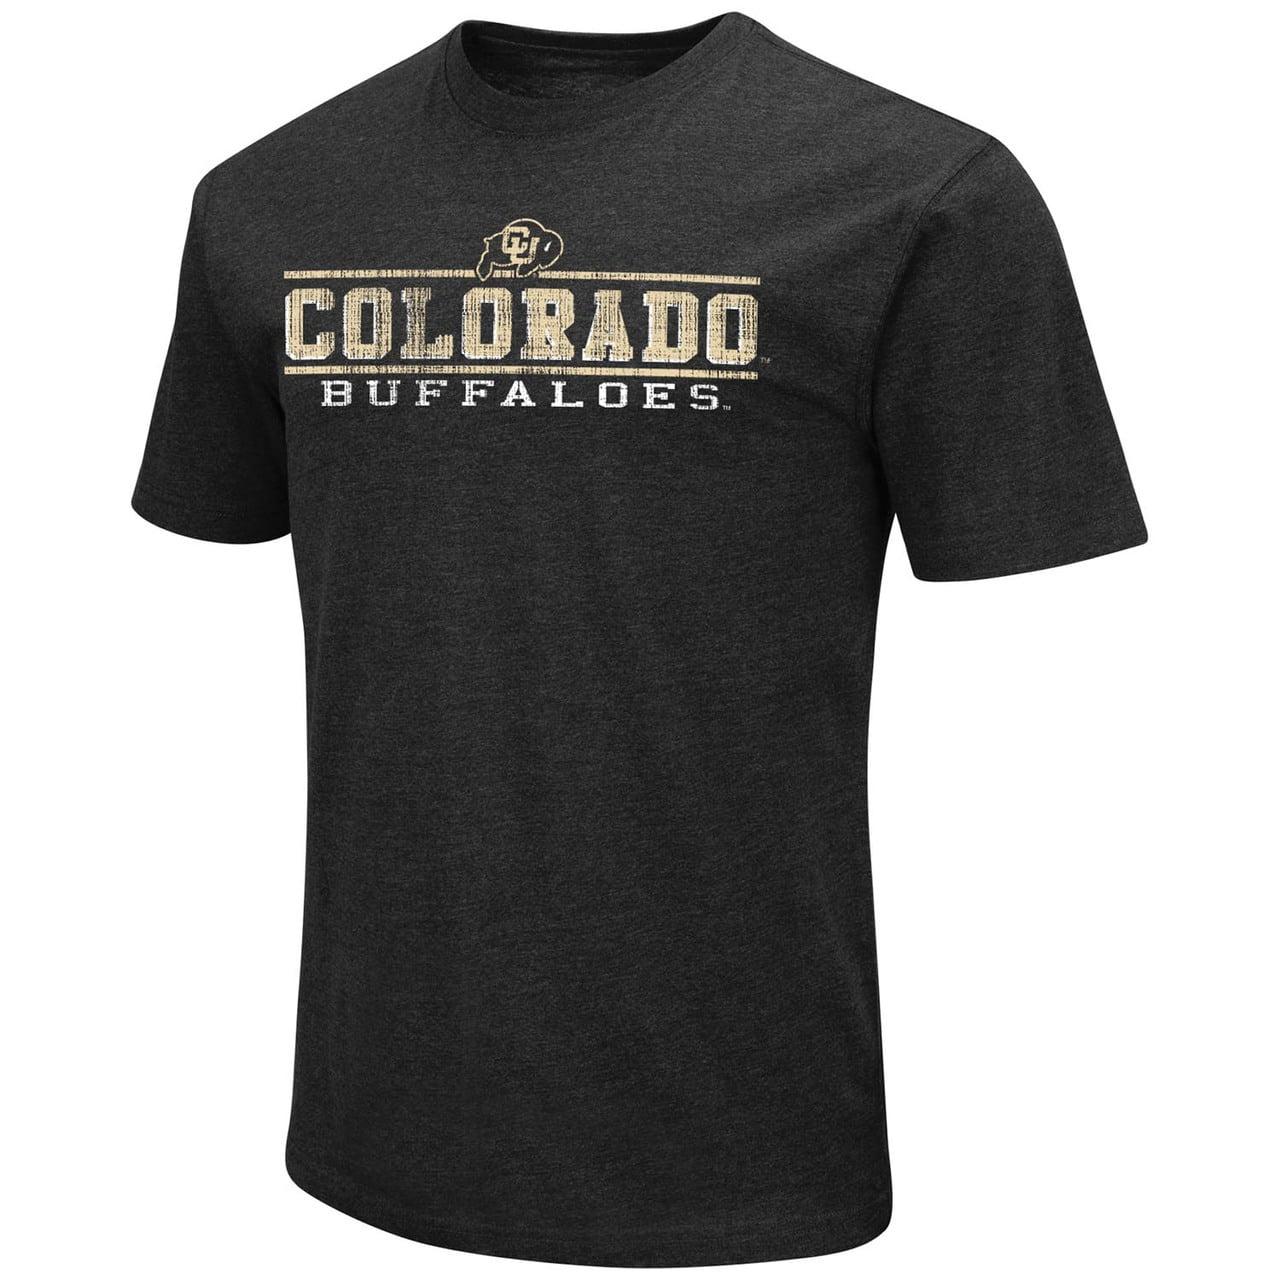 Colorado Buffaloes Adult Soft Vintage Tailgate T-Shirt  - Black